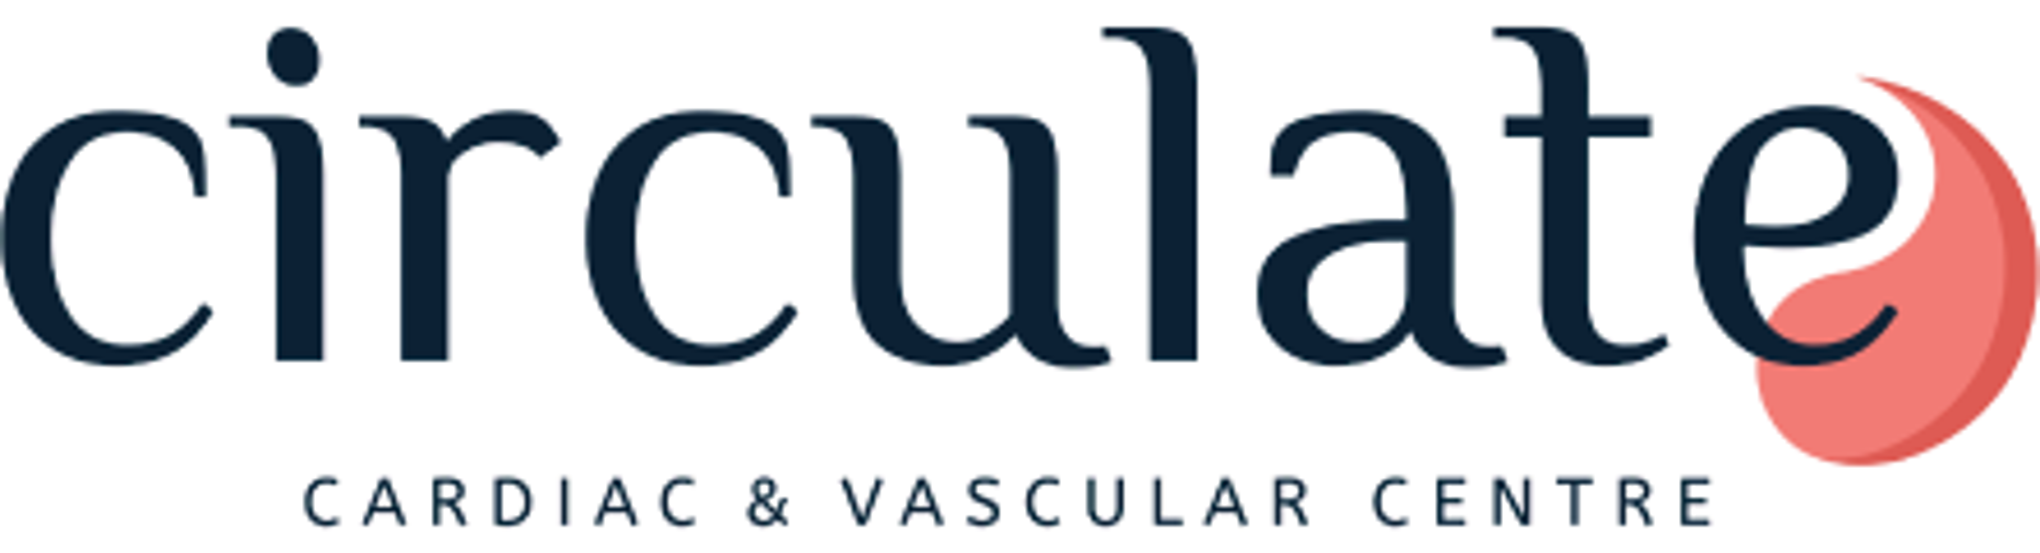 Circulate - cardiac & vascular centre